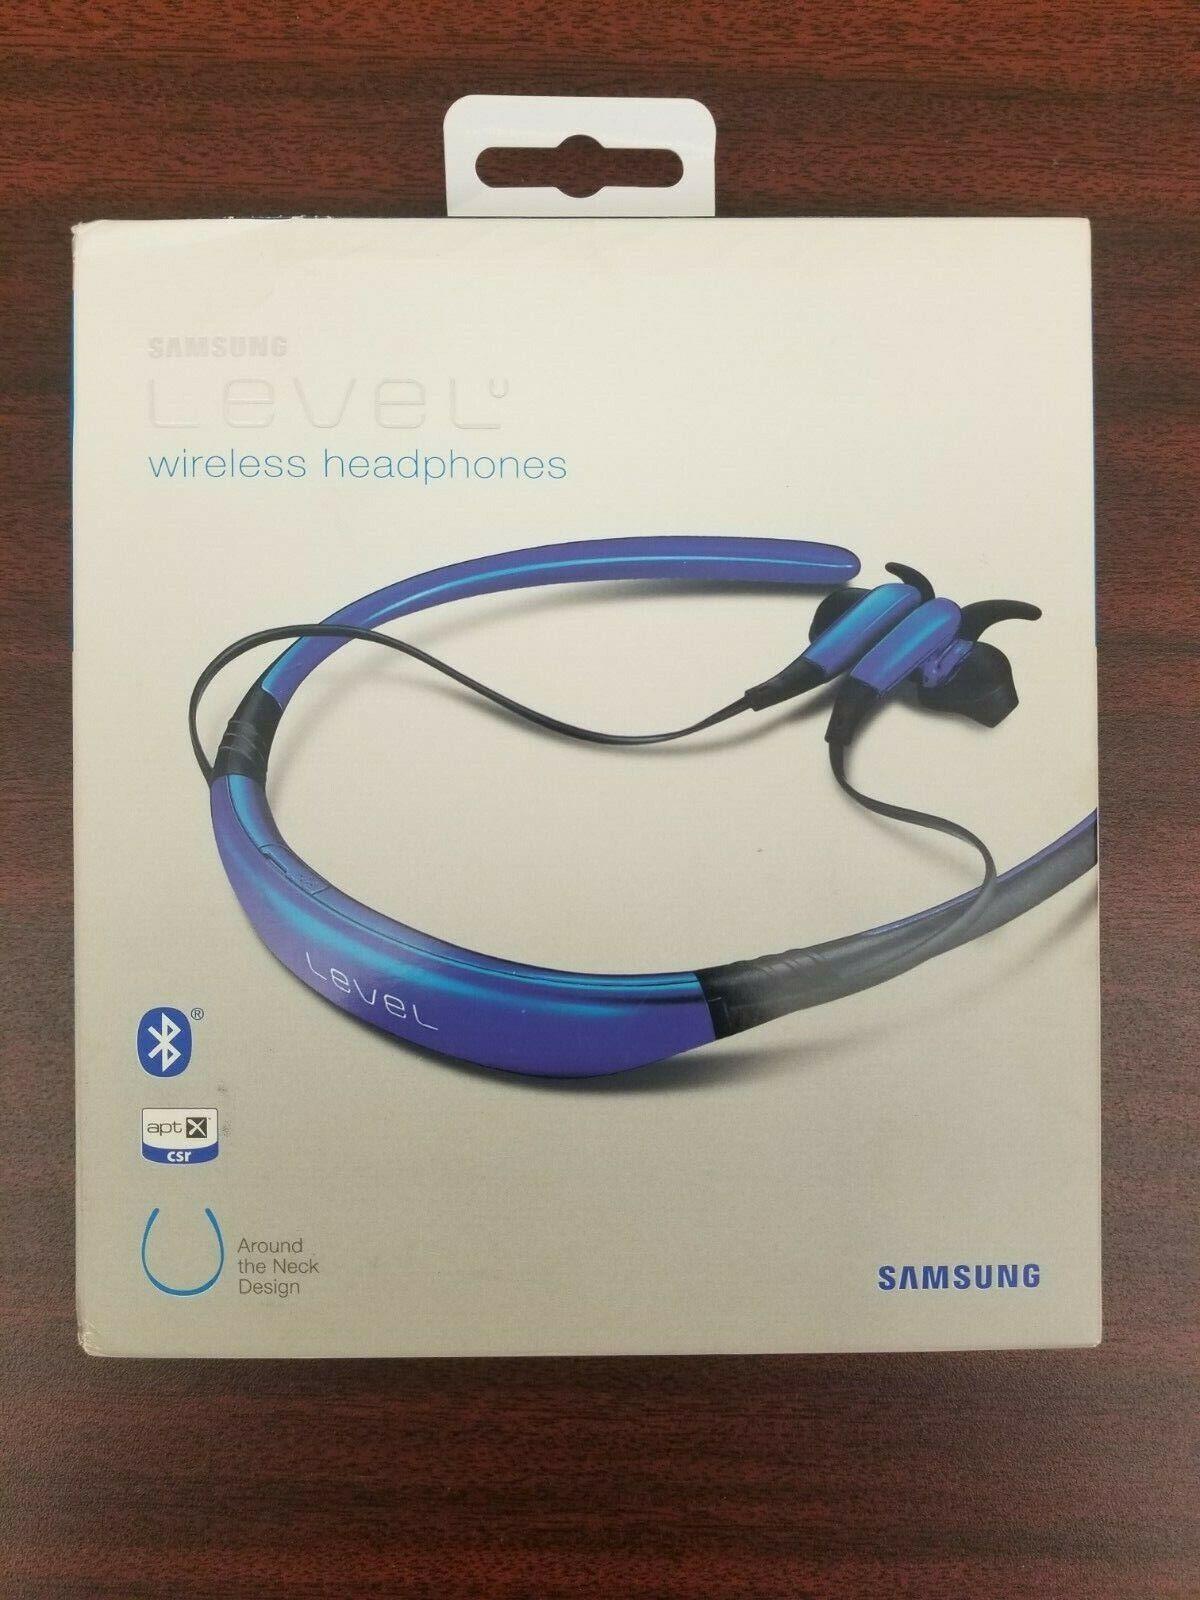 Samsung Level U Bluetooth Wireless In Ear Headphones W Microphone Blue New Nib For Sale Online